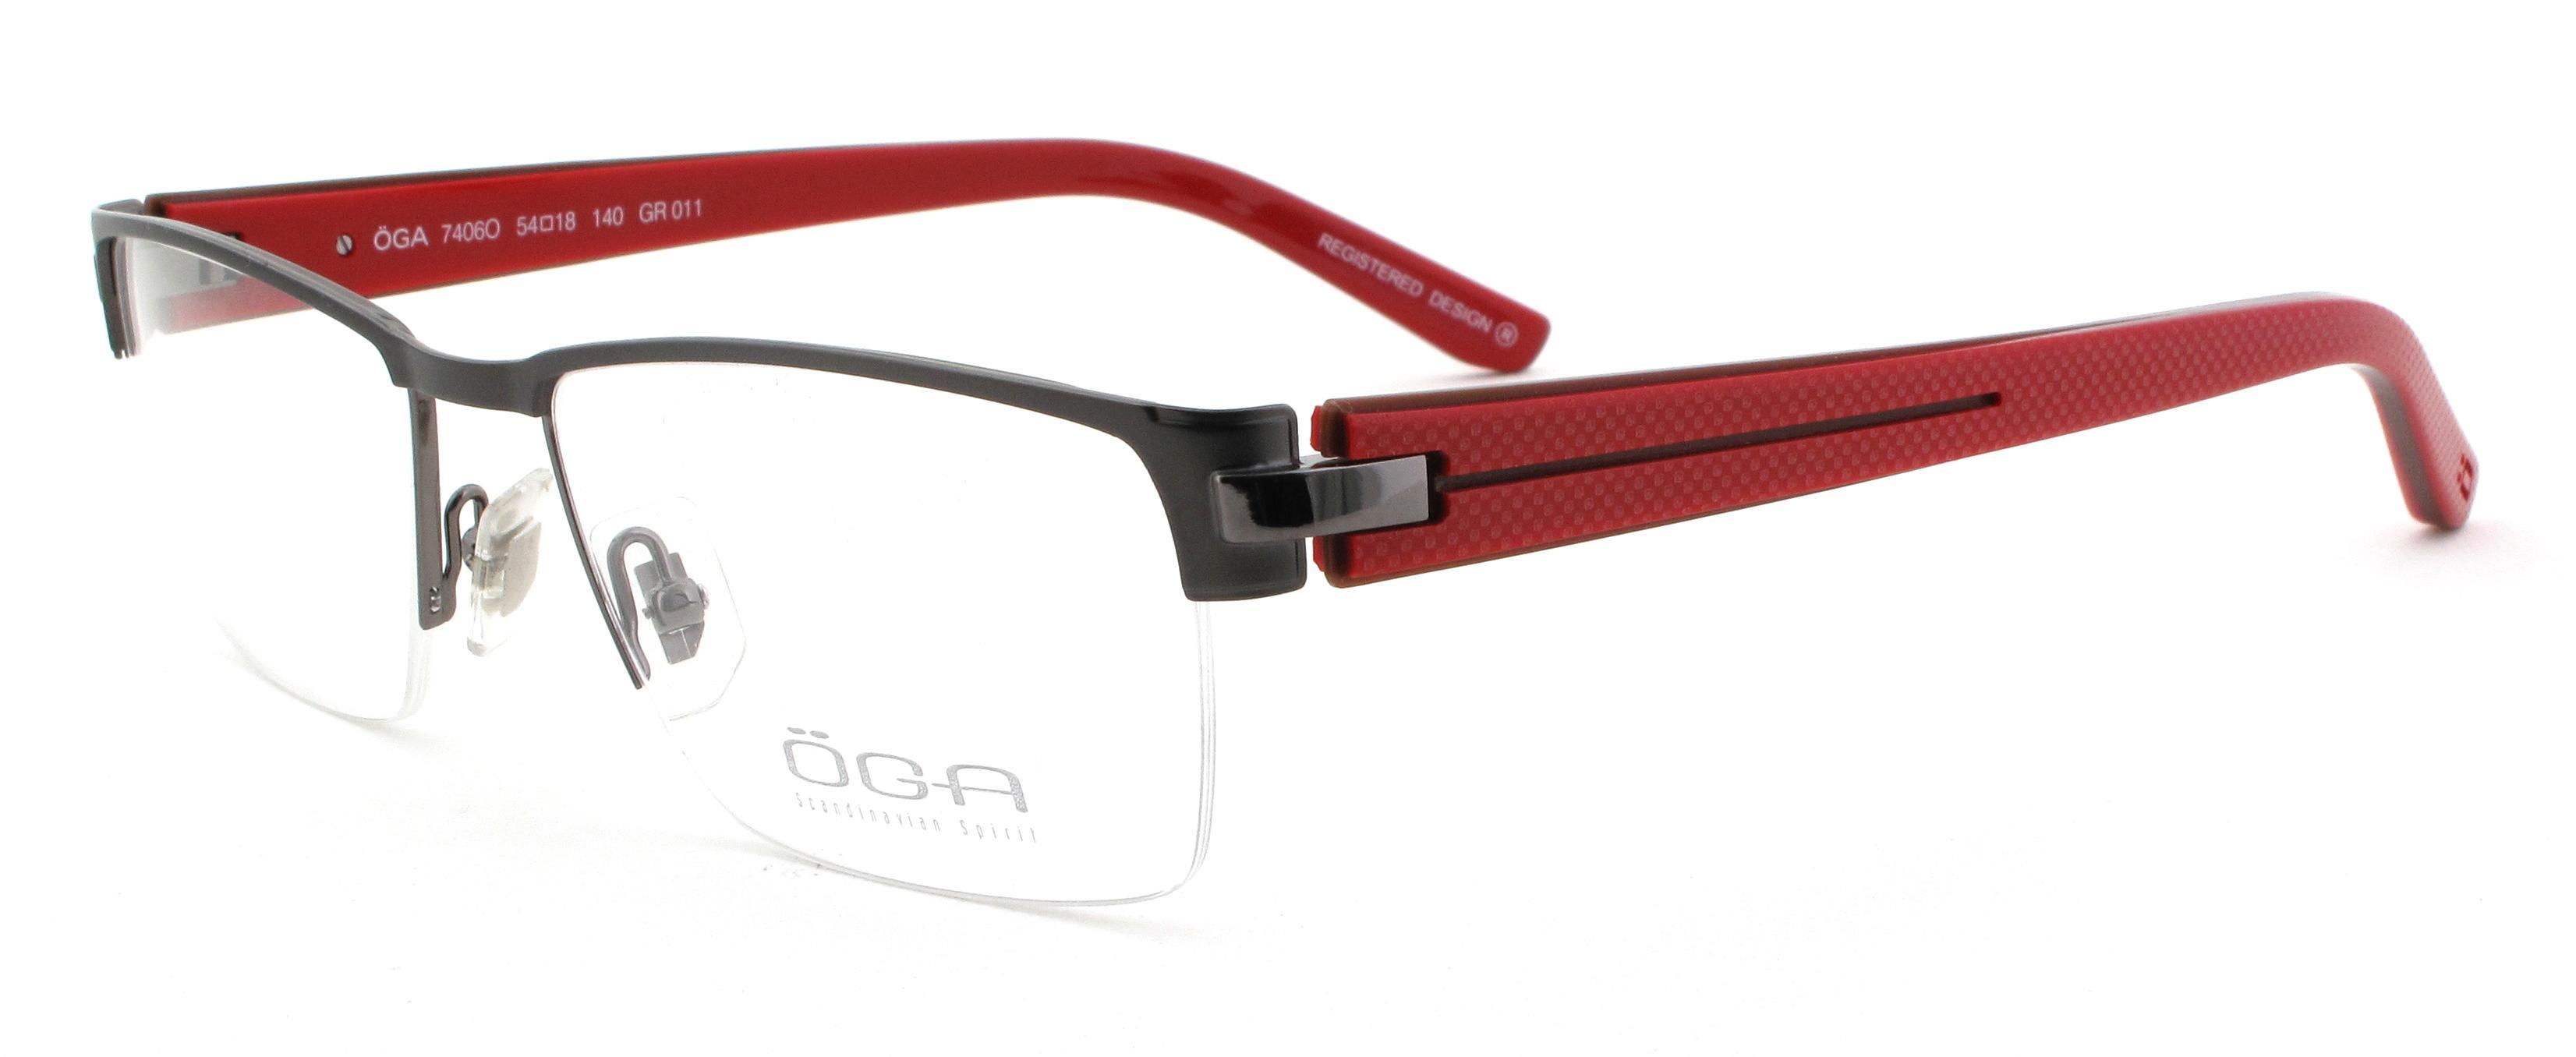 GR011 7406O TALVAC 1 Glasses, ÖGA Scandinavian Spirit